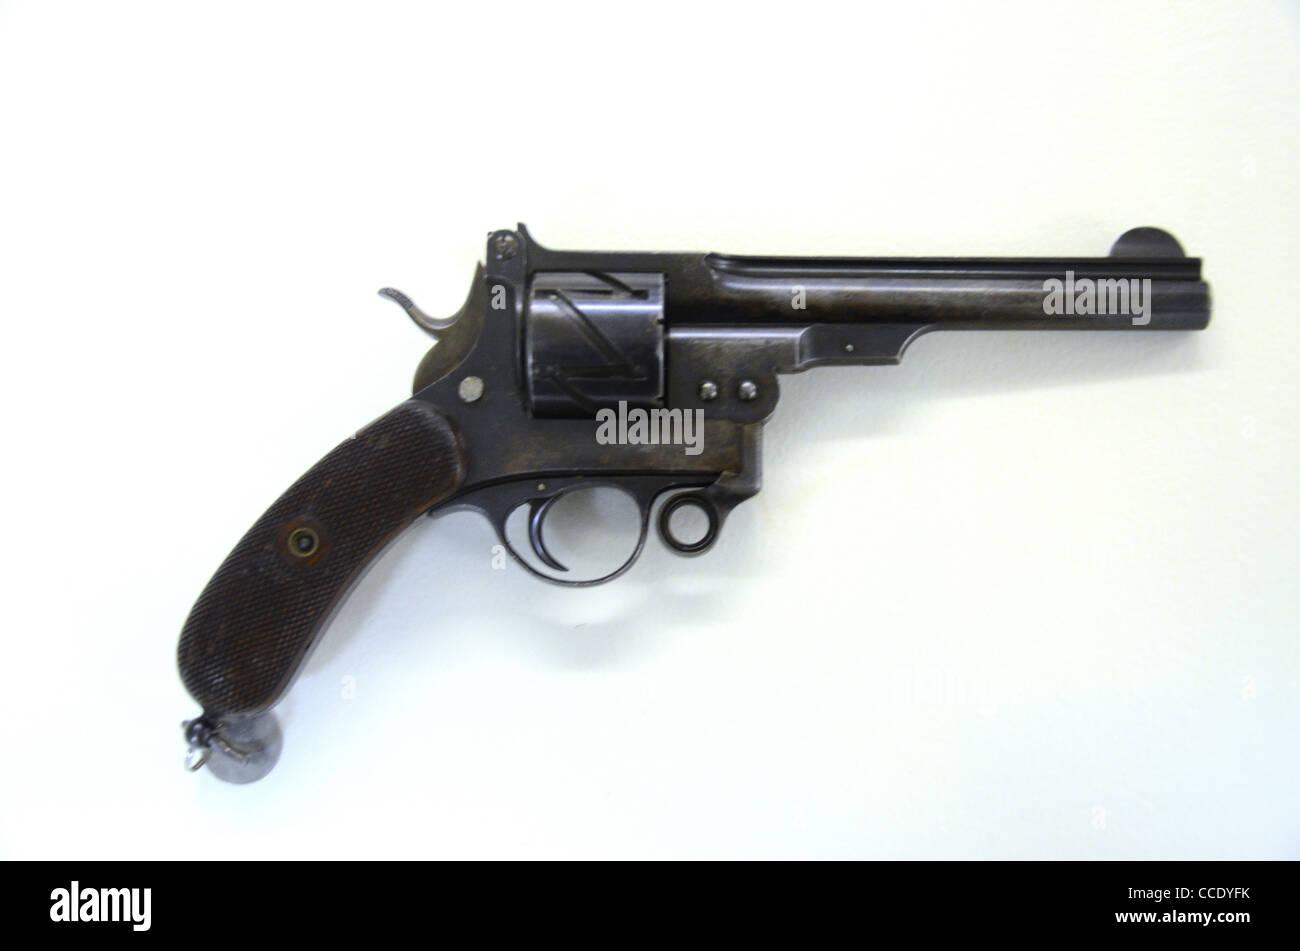 Mauser ZIG ZAG Revolver M78 10.6mm 6 shot military pistol 1878 - Stock Image